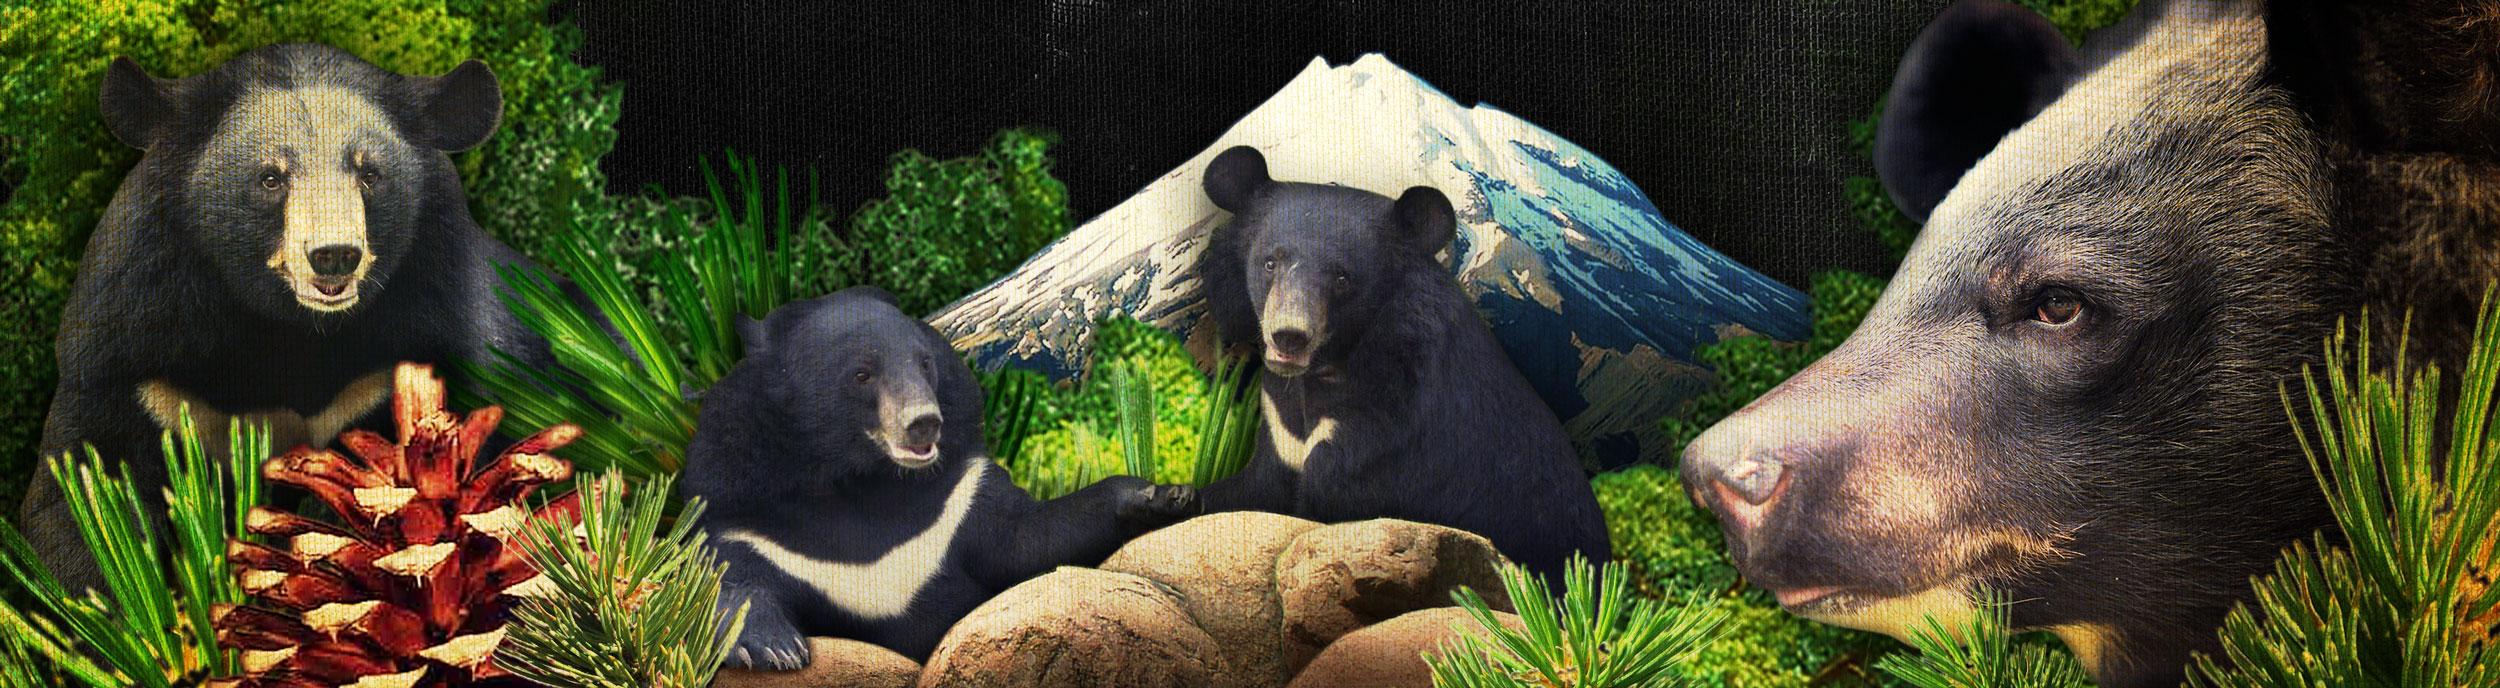 BearSlideXXL